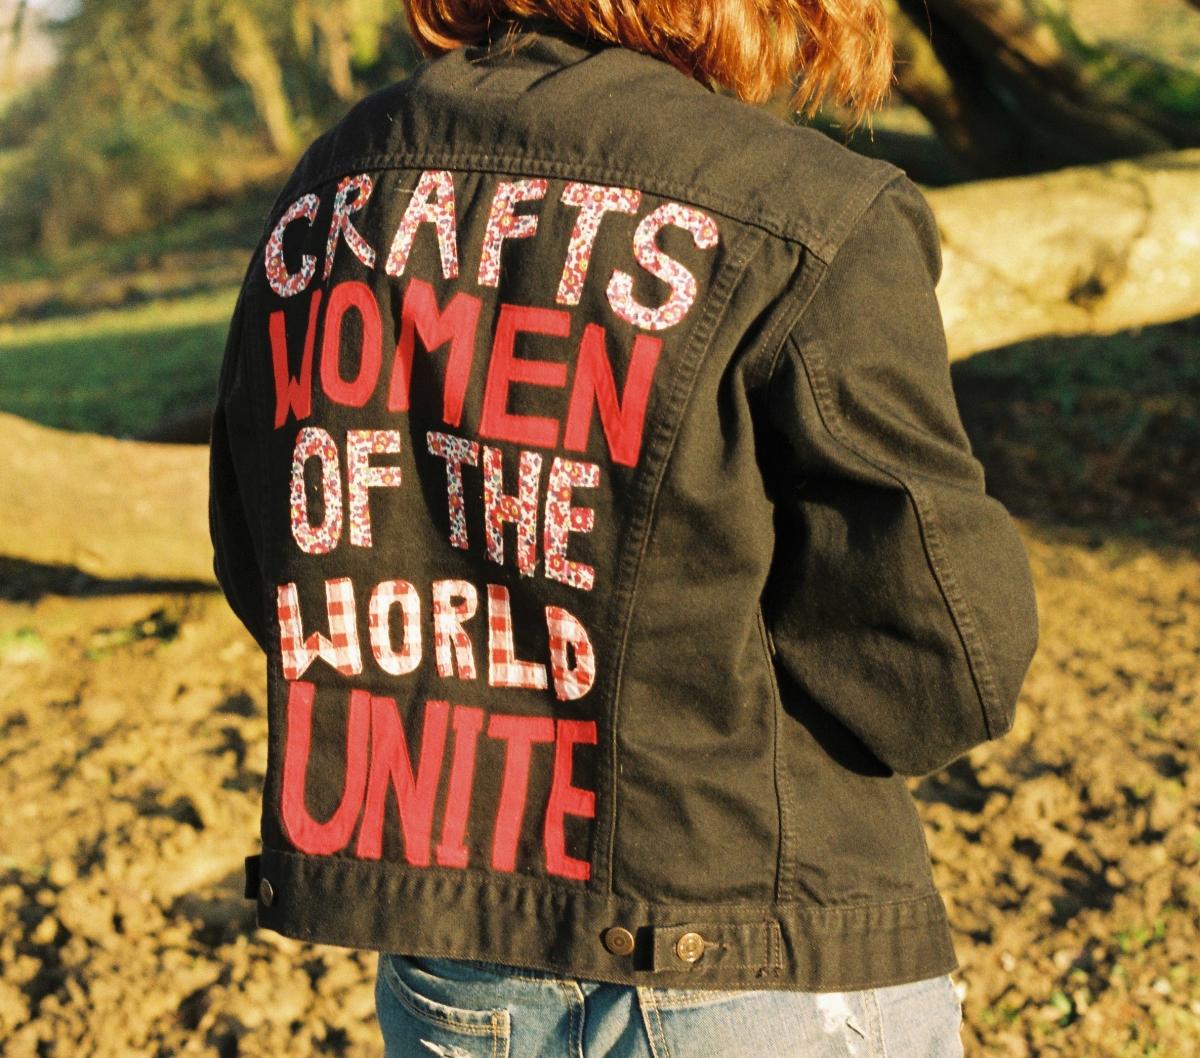 Fashion ethics, a Feministissue